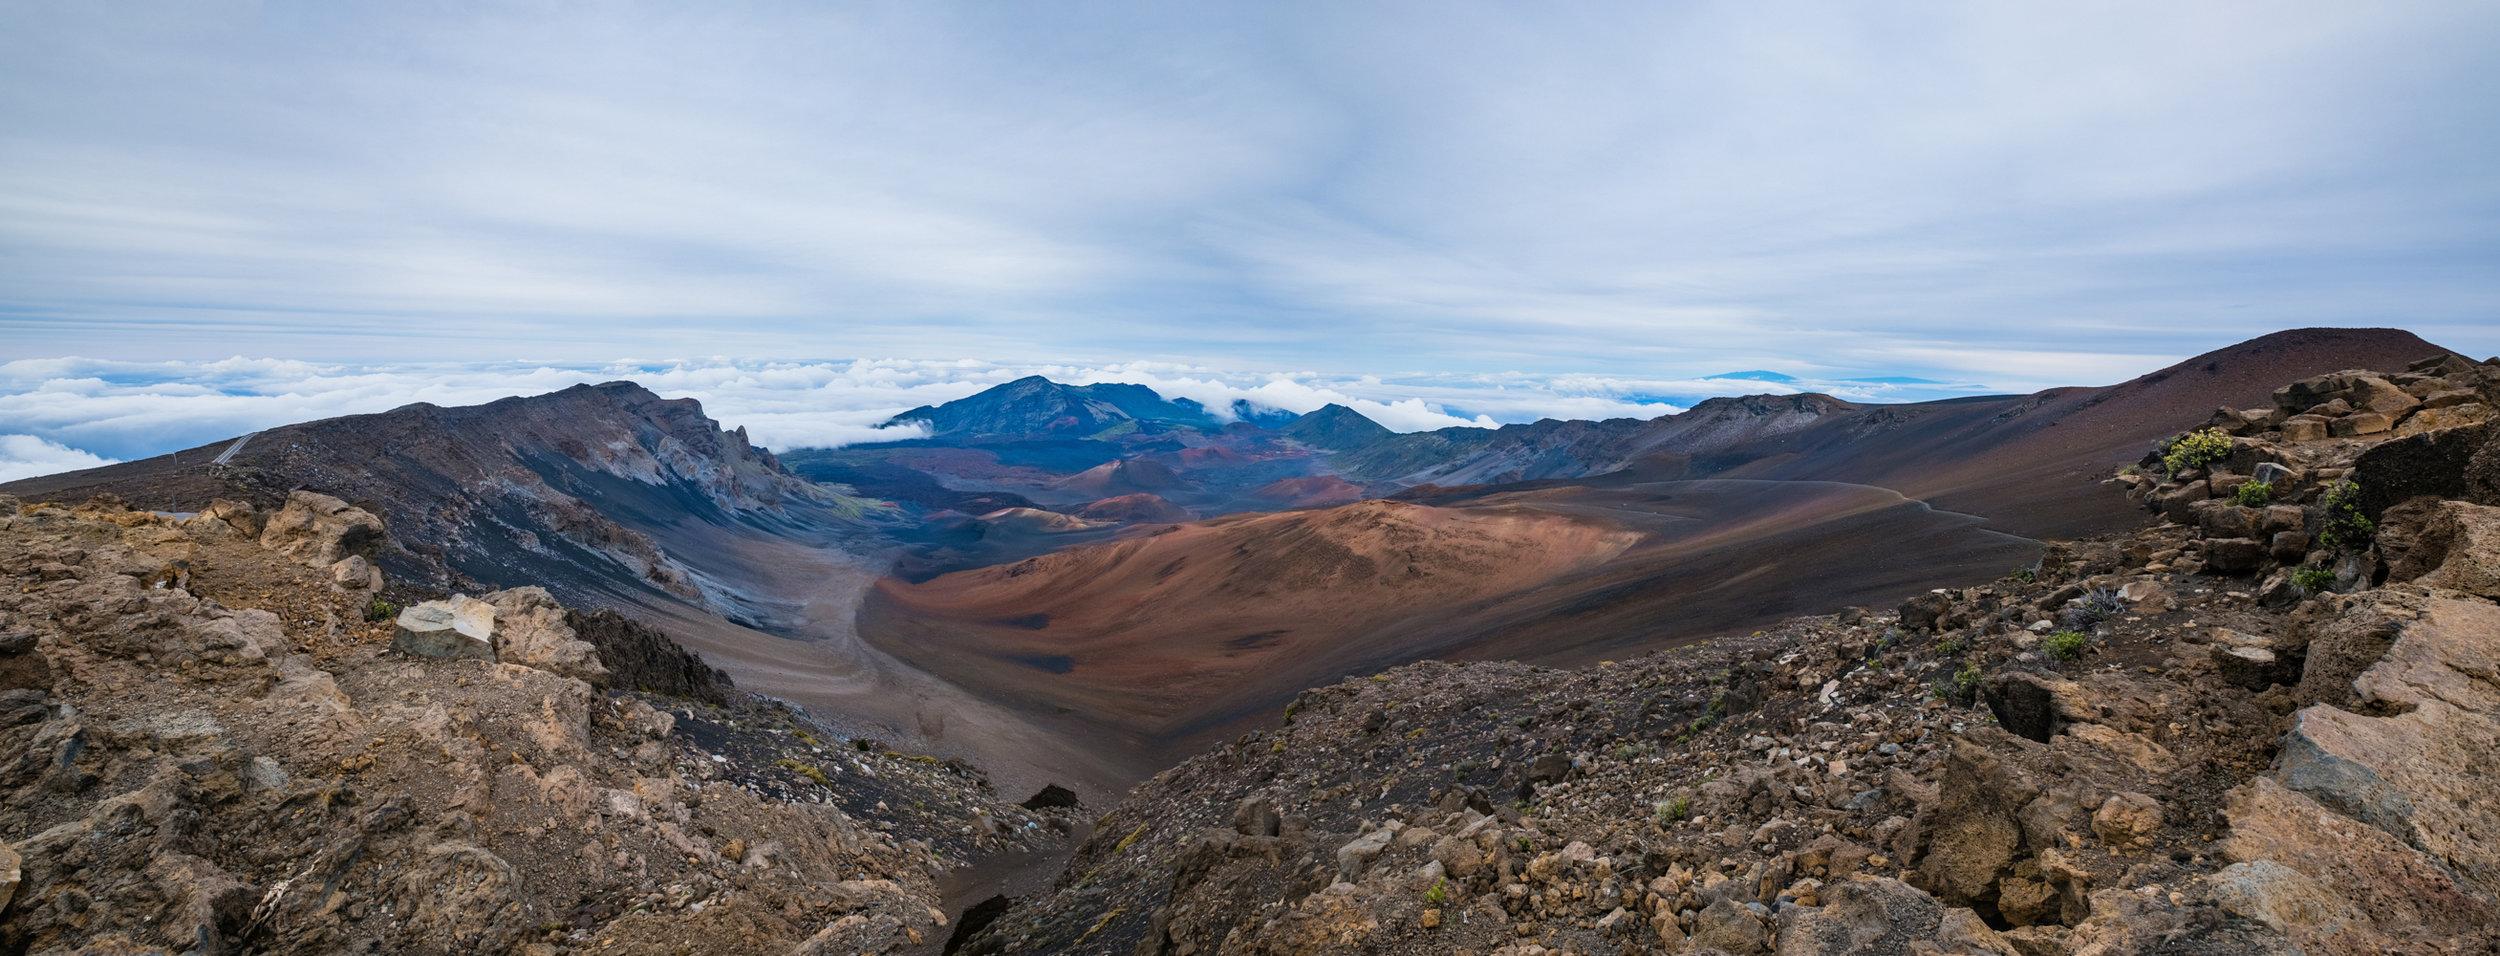 haleakala crater maui hawaii panoramic